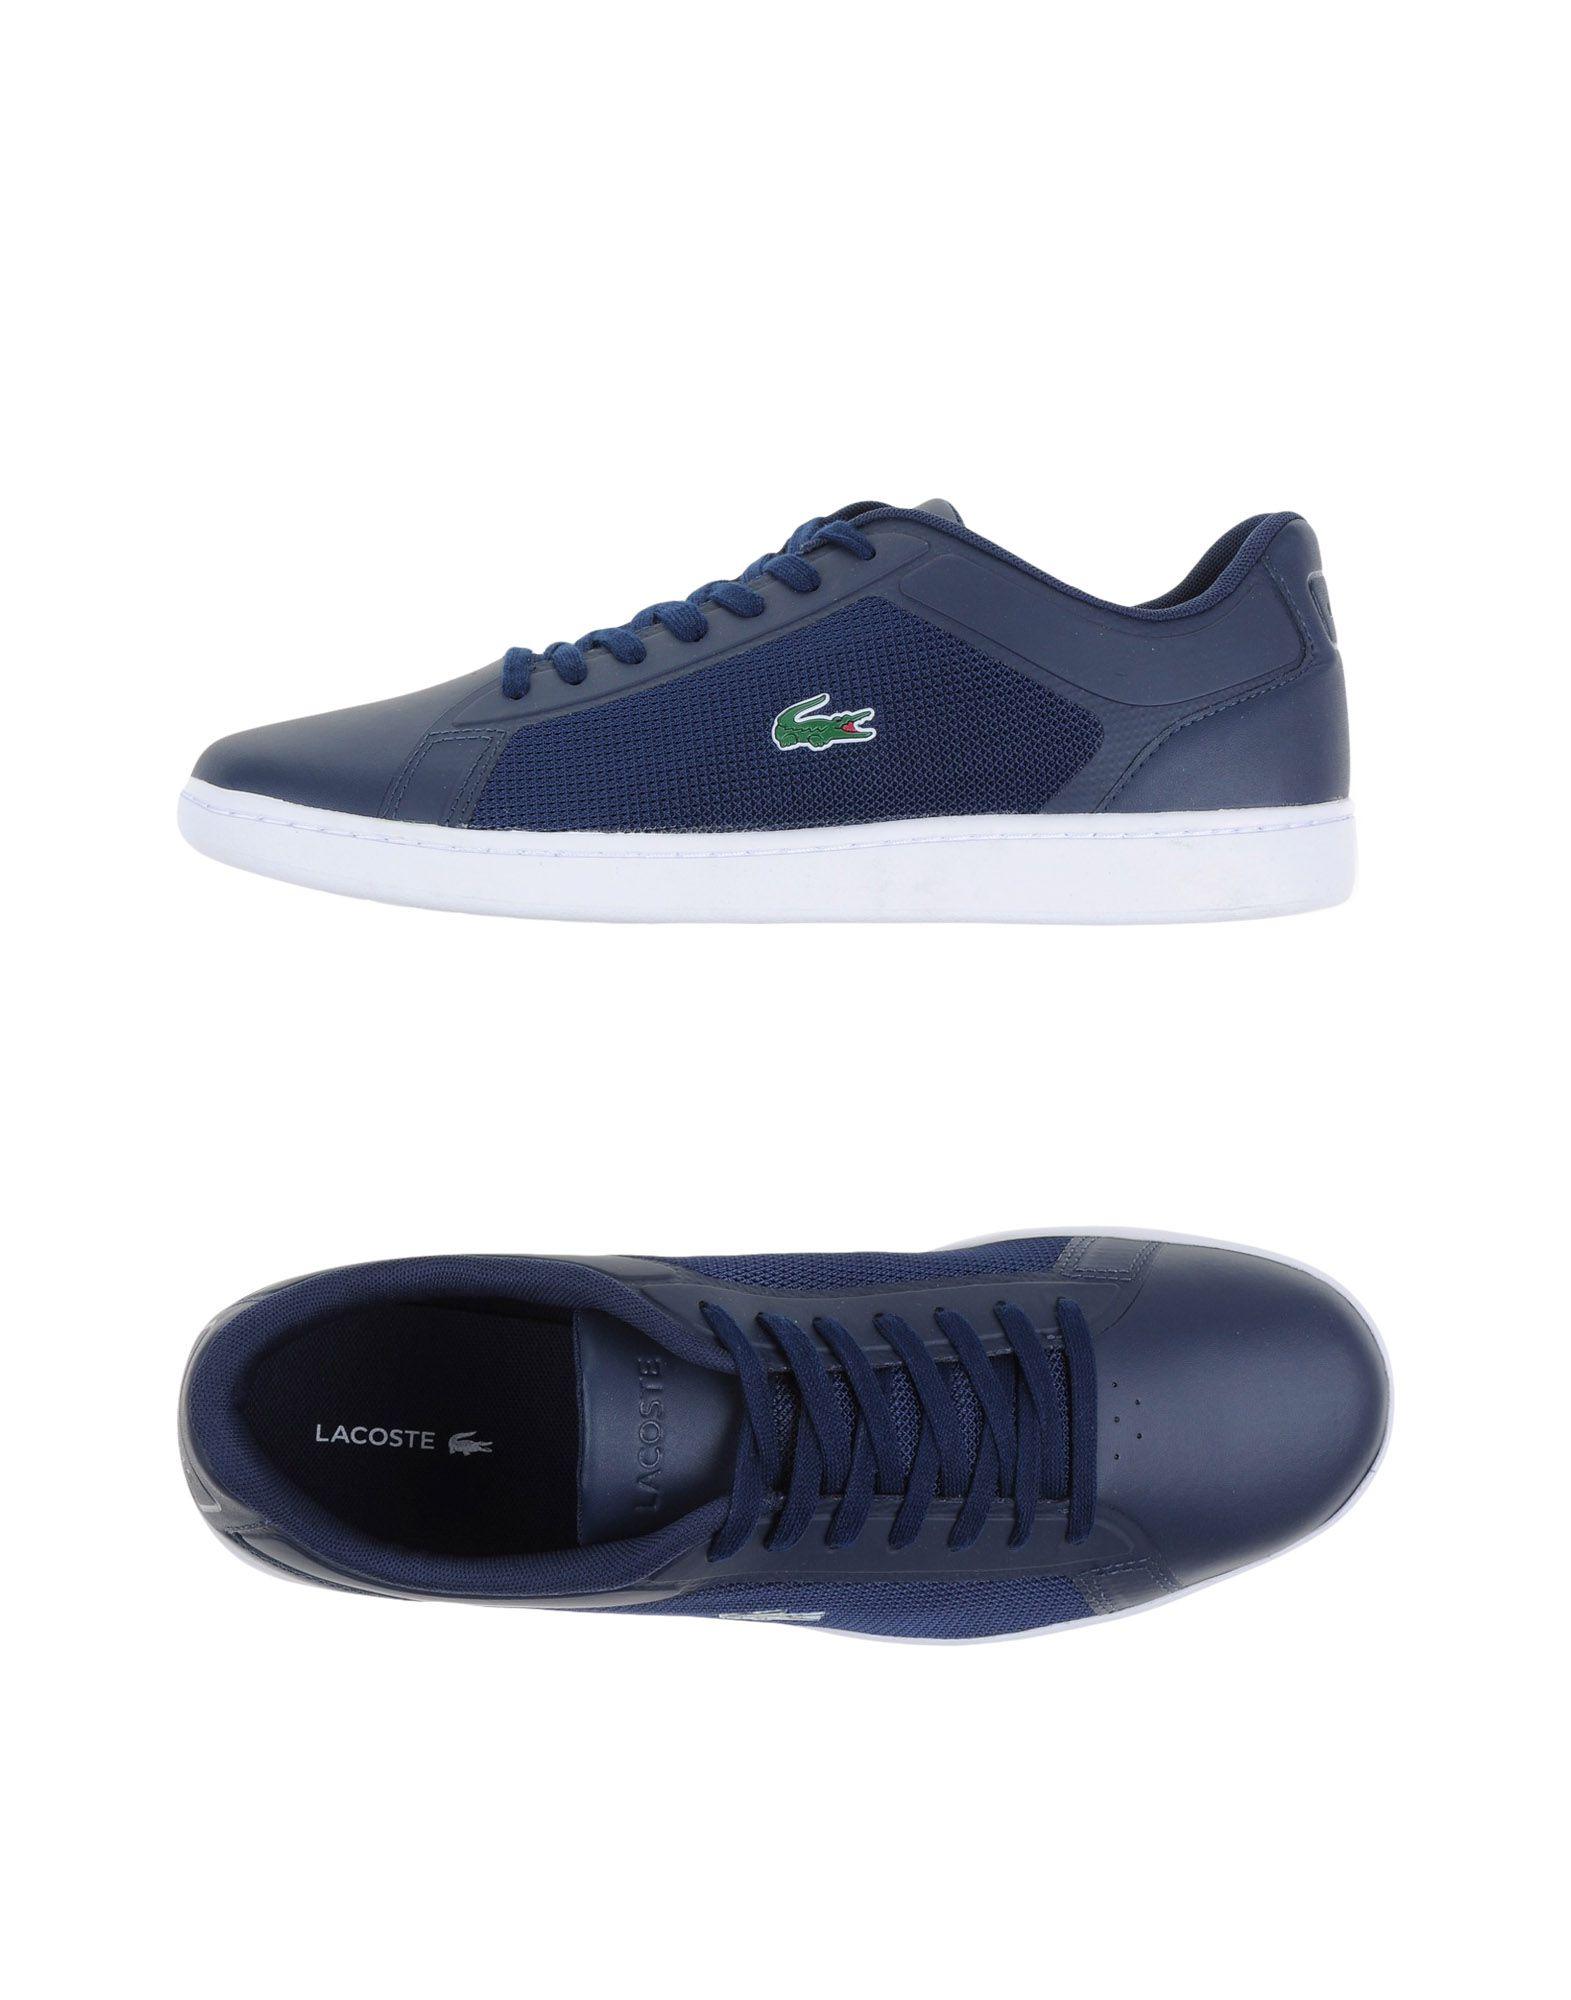 Sneakers Lacoste Endliner 116 2 - Homme - Sneakers Lacoste sur